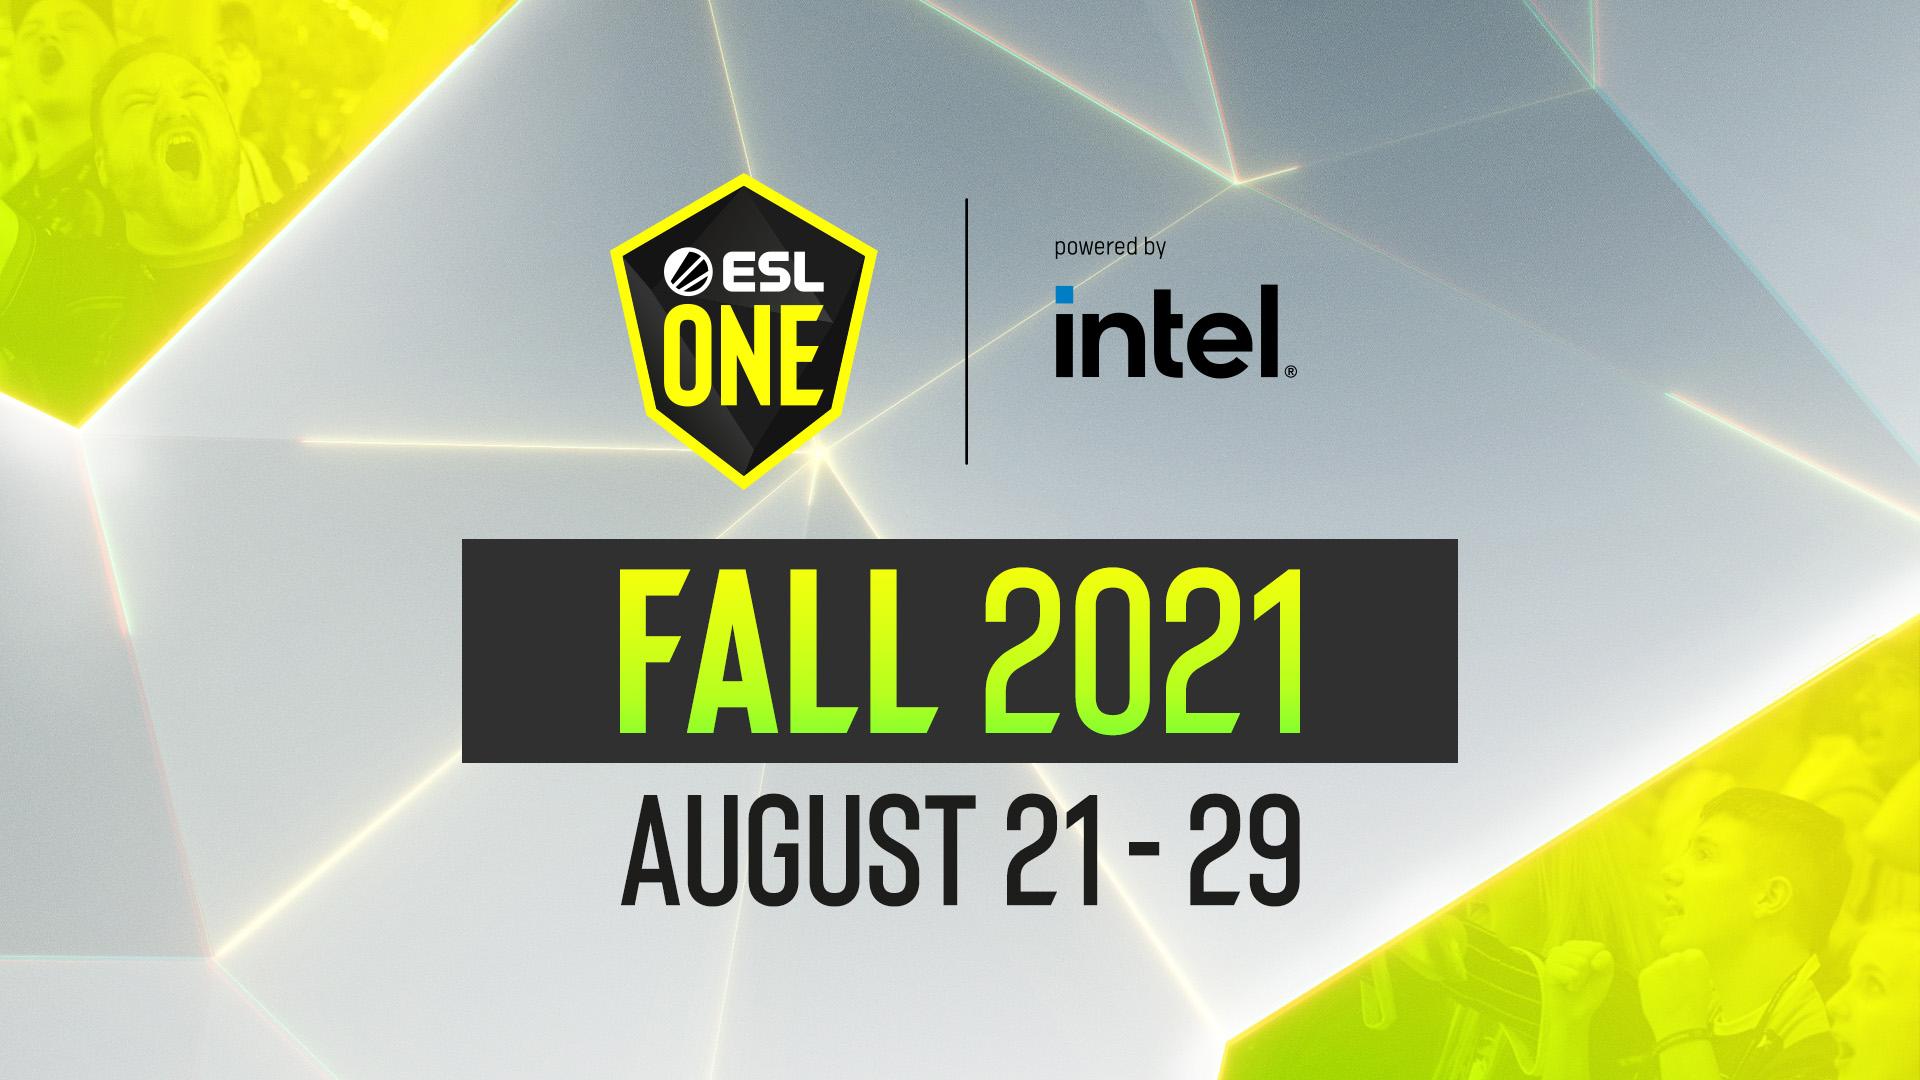 esl-dota-fall-2021